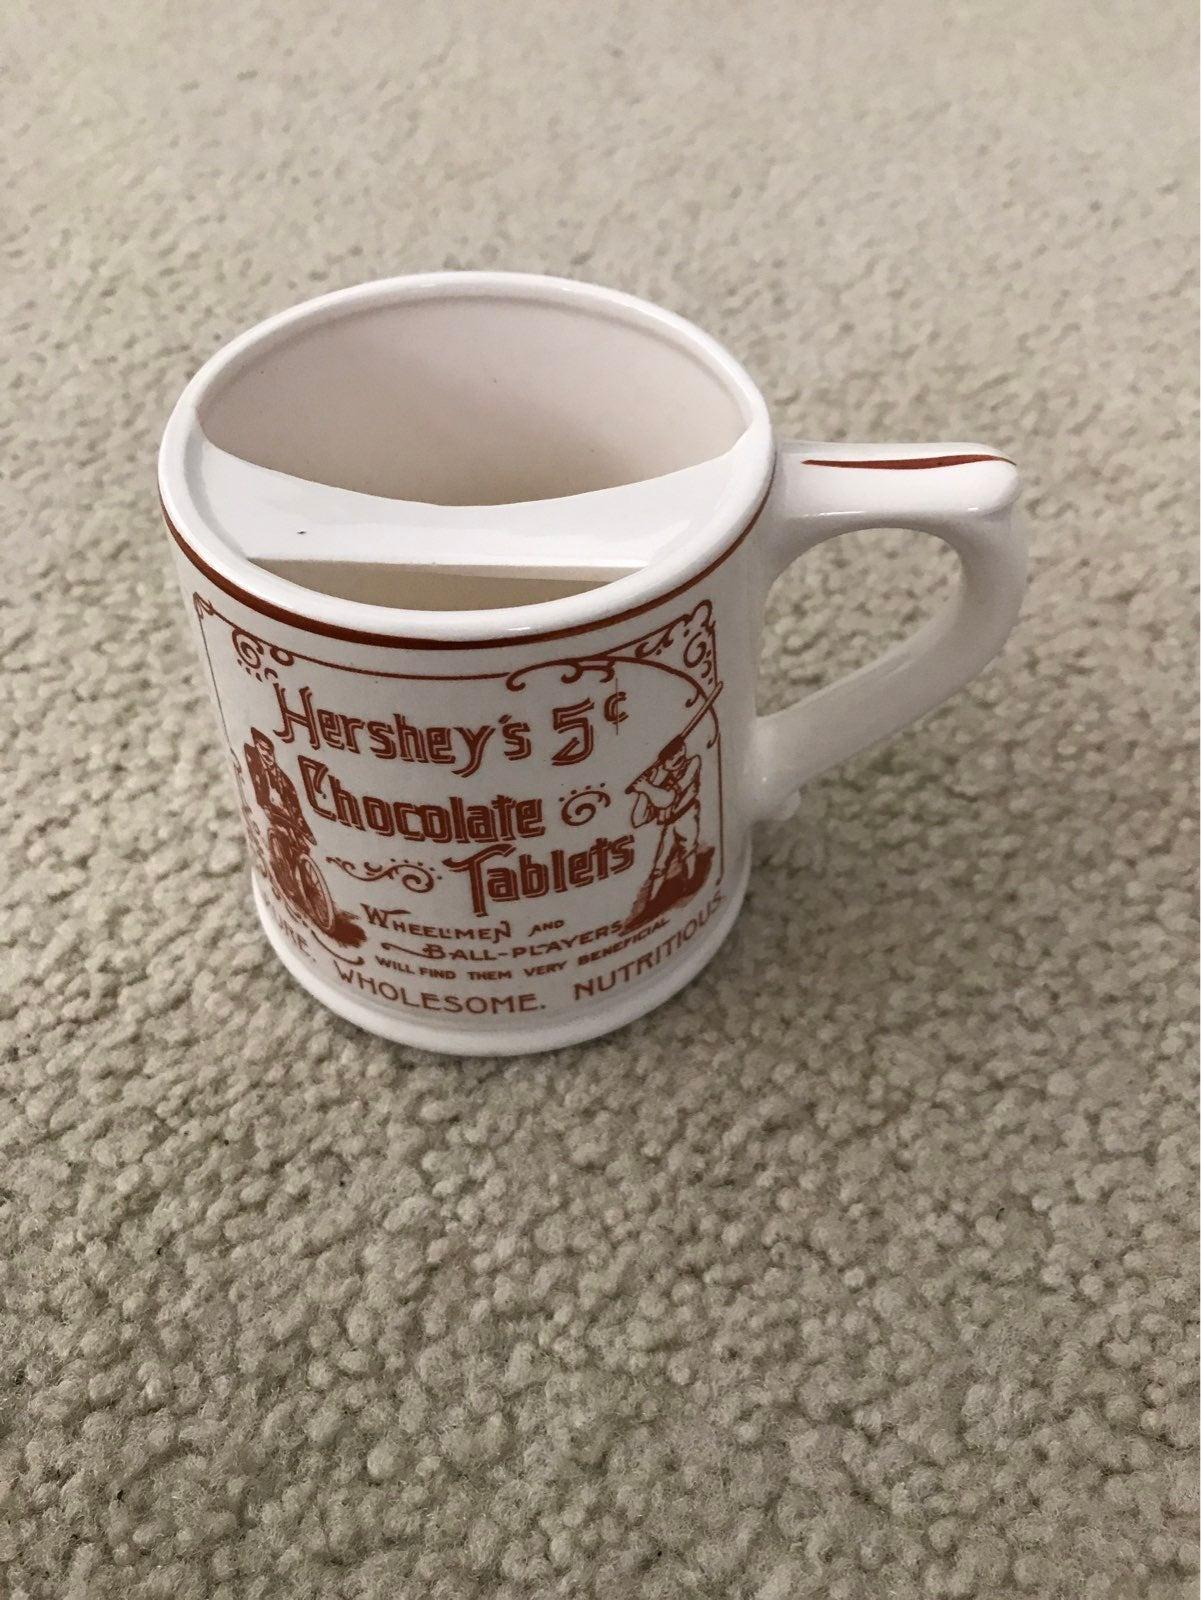 Vintage Hershey's mustache coffee mug